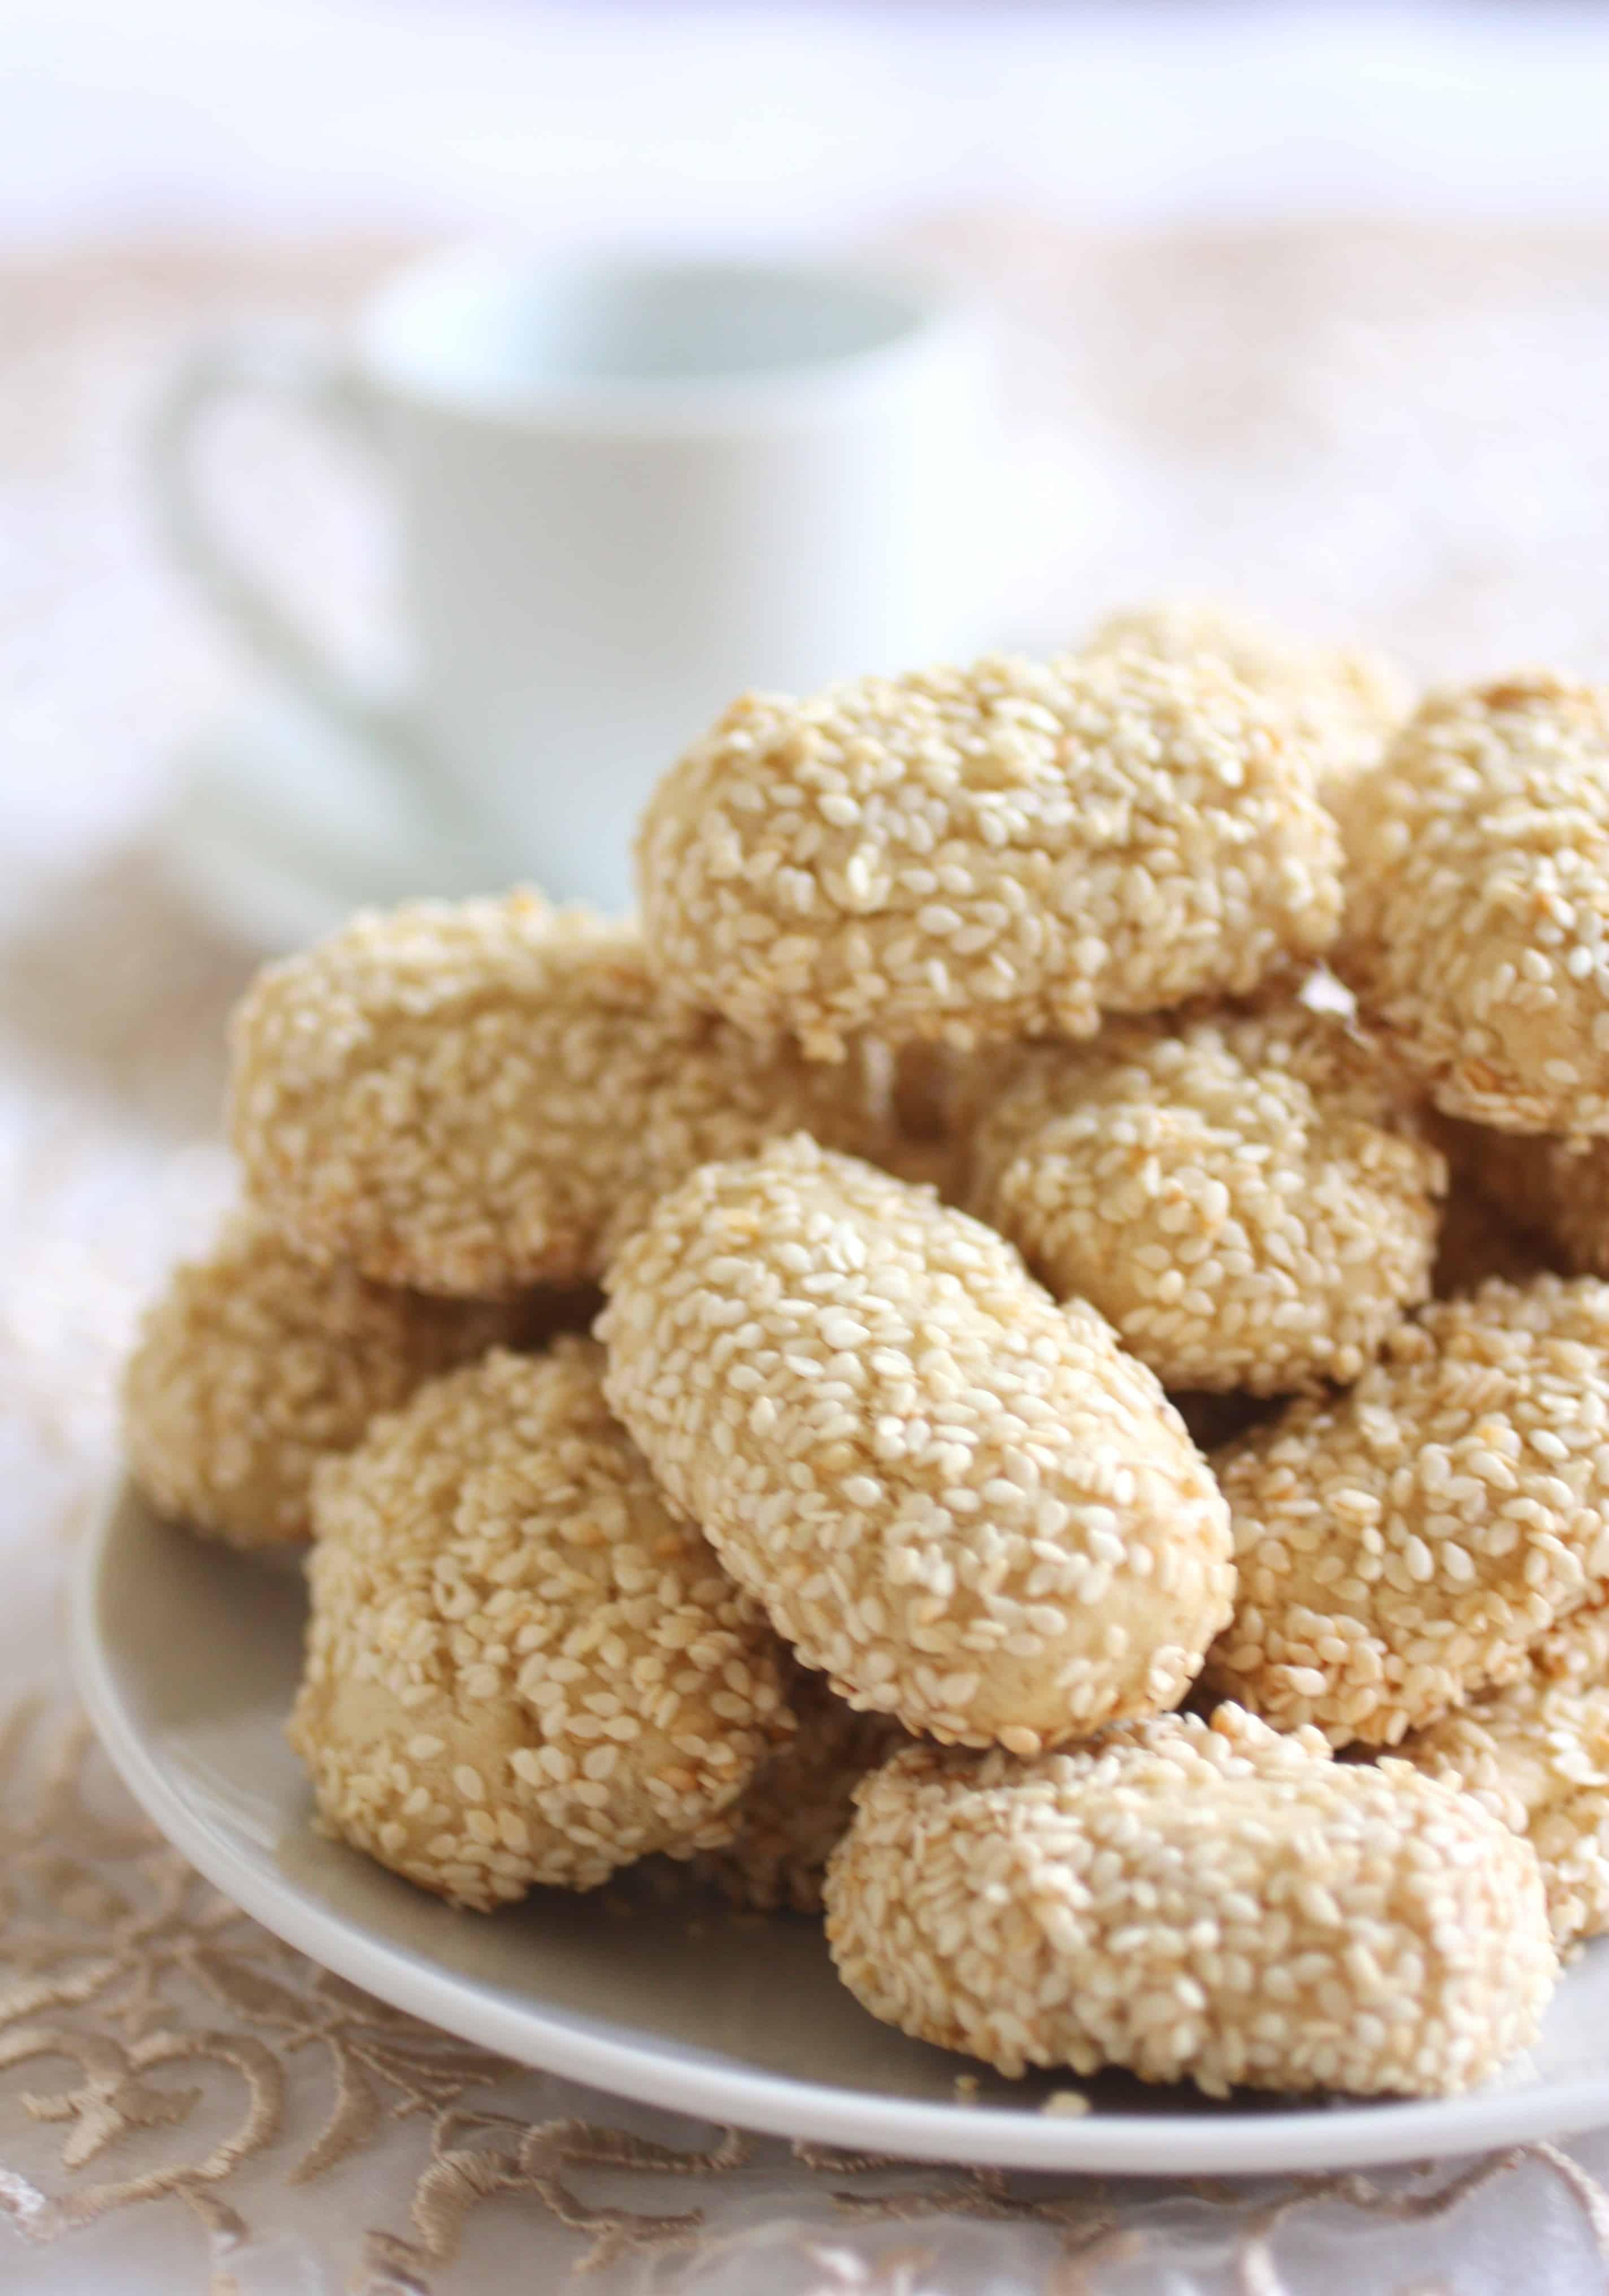 Italian Seed Cookies